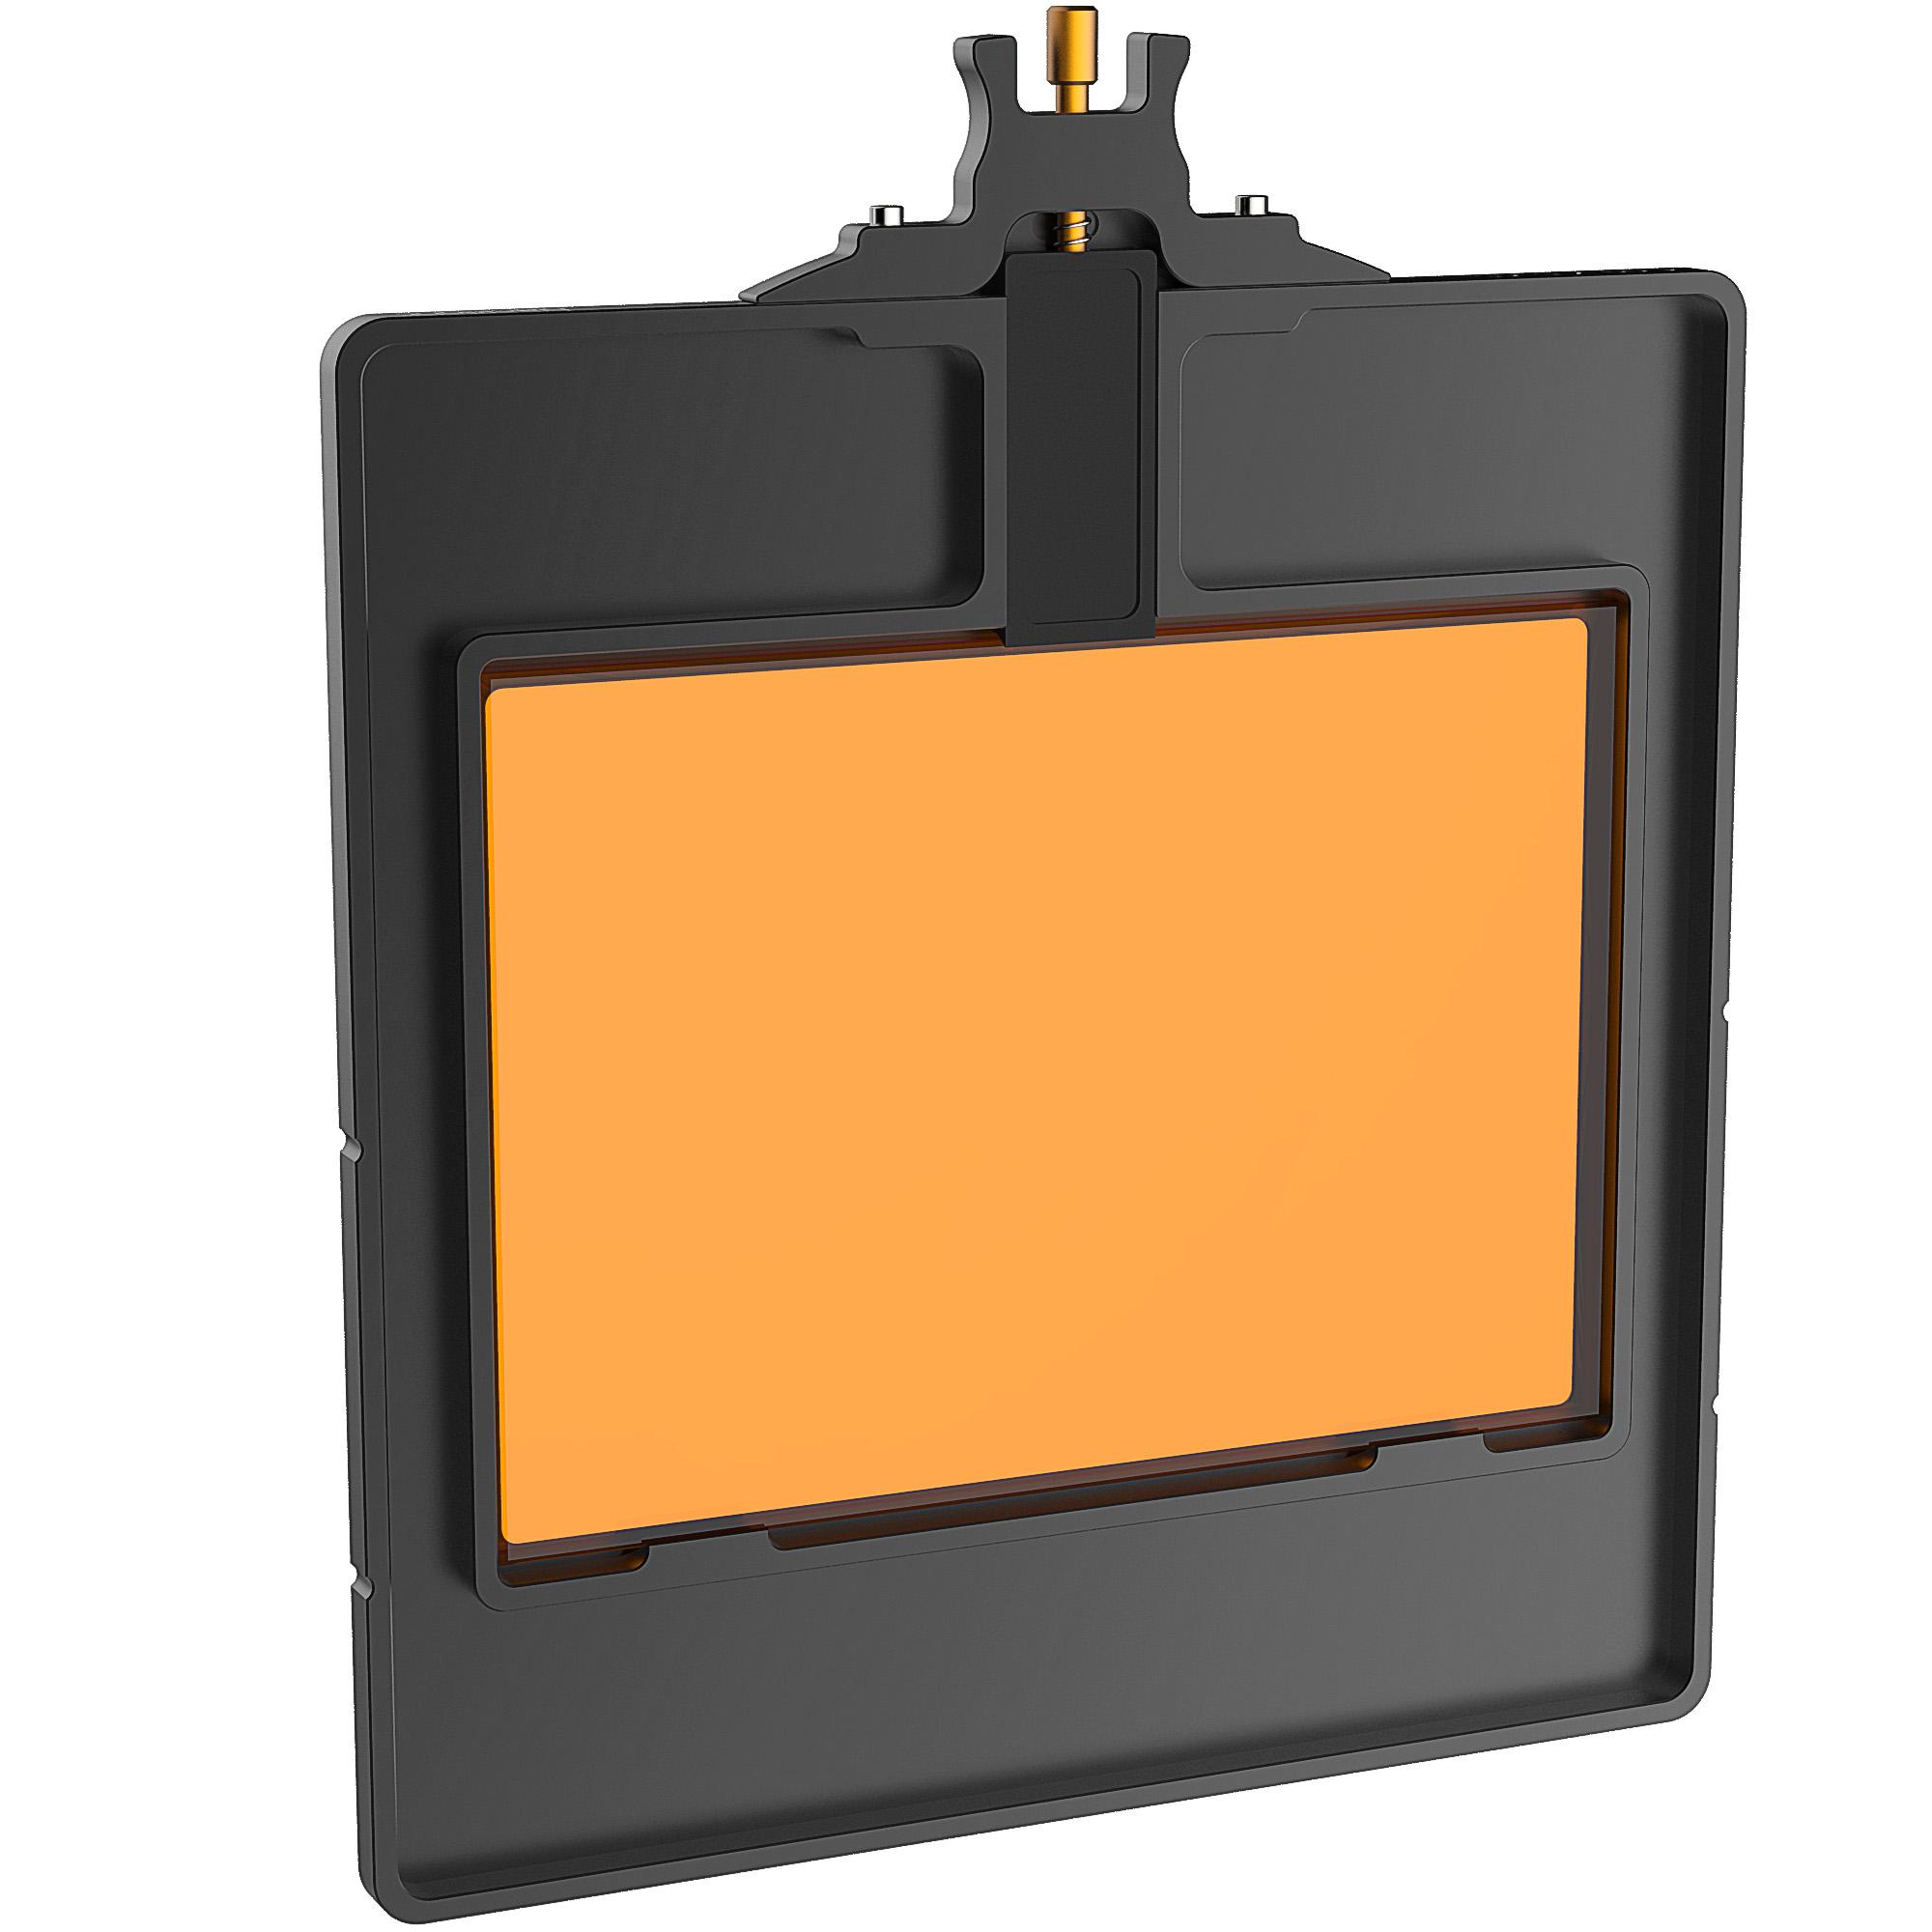 B1251.1035 Blacklight 6.6 x 4.65 2